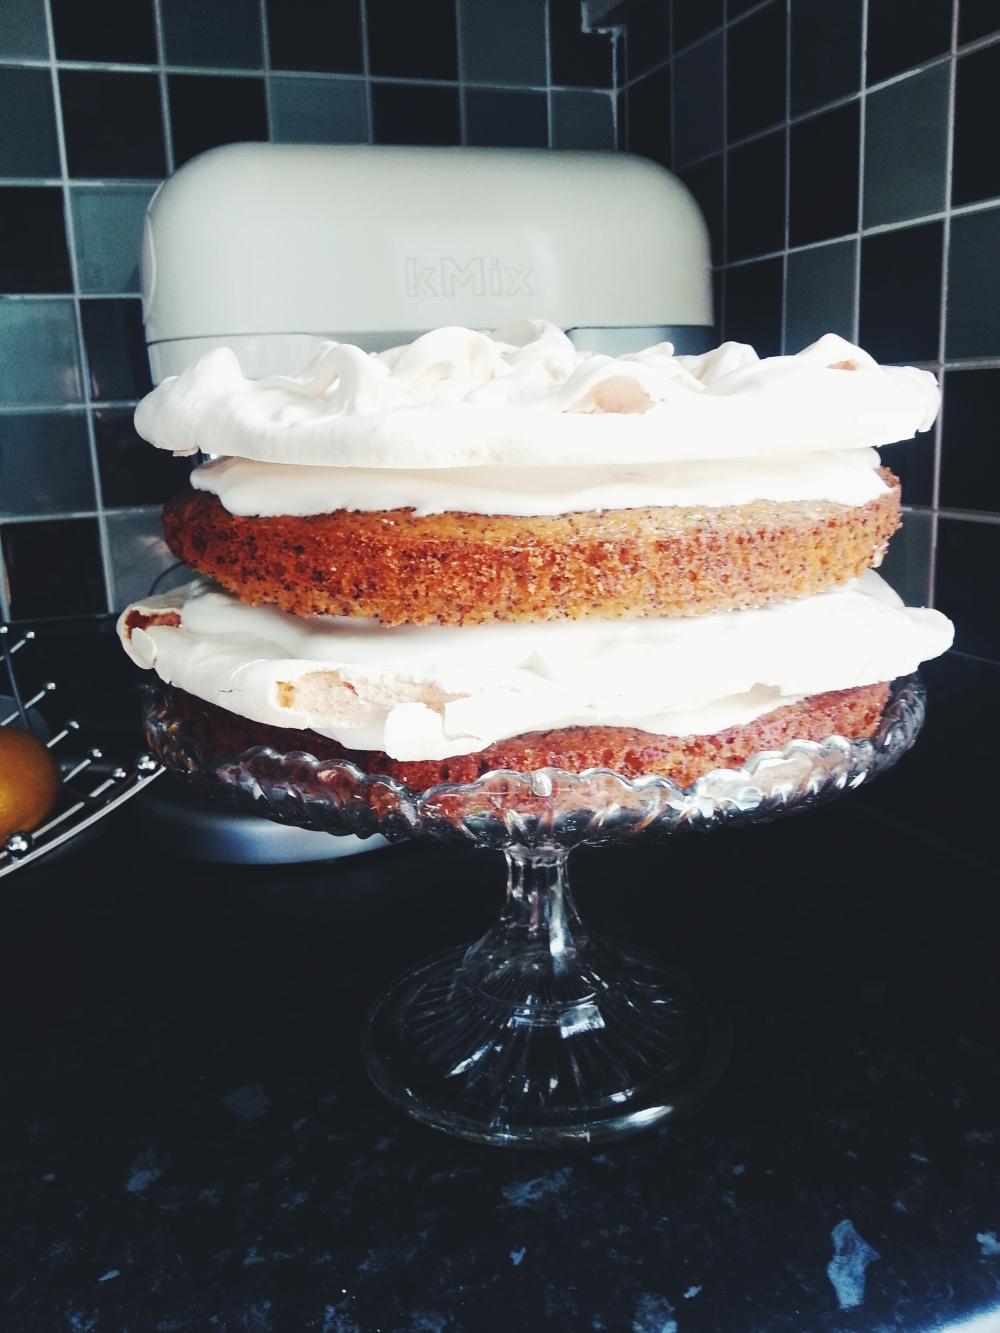 Jamie Oliver Lemon Yogurt Cake Recipe: Jamie Oliver Vs Delia…on Meringues